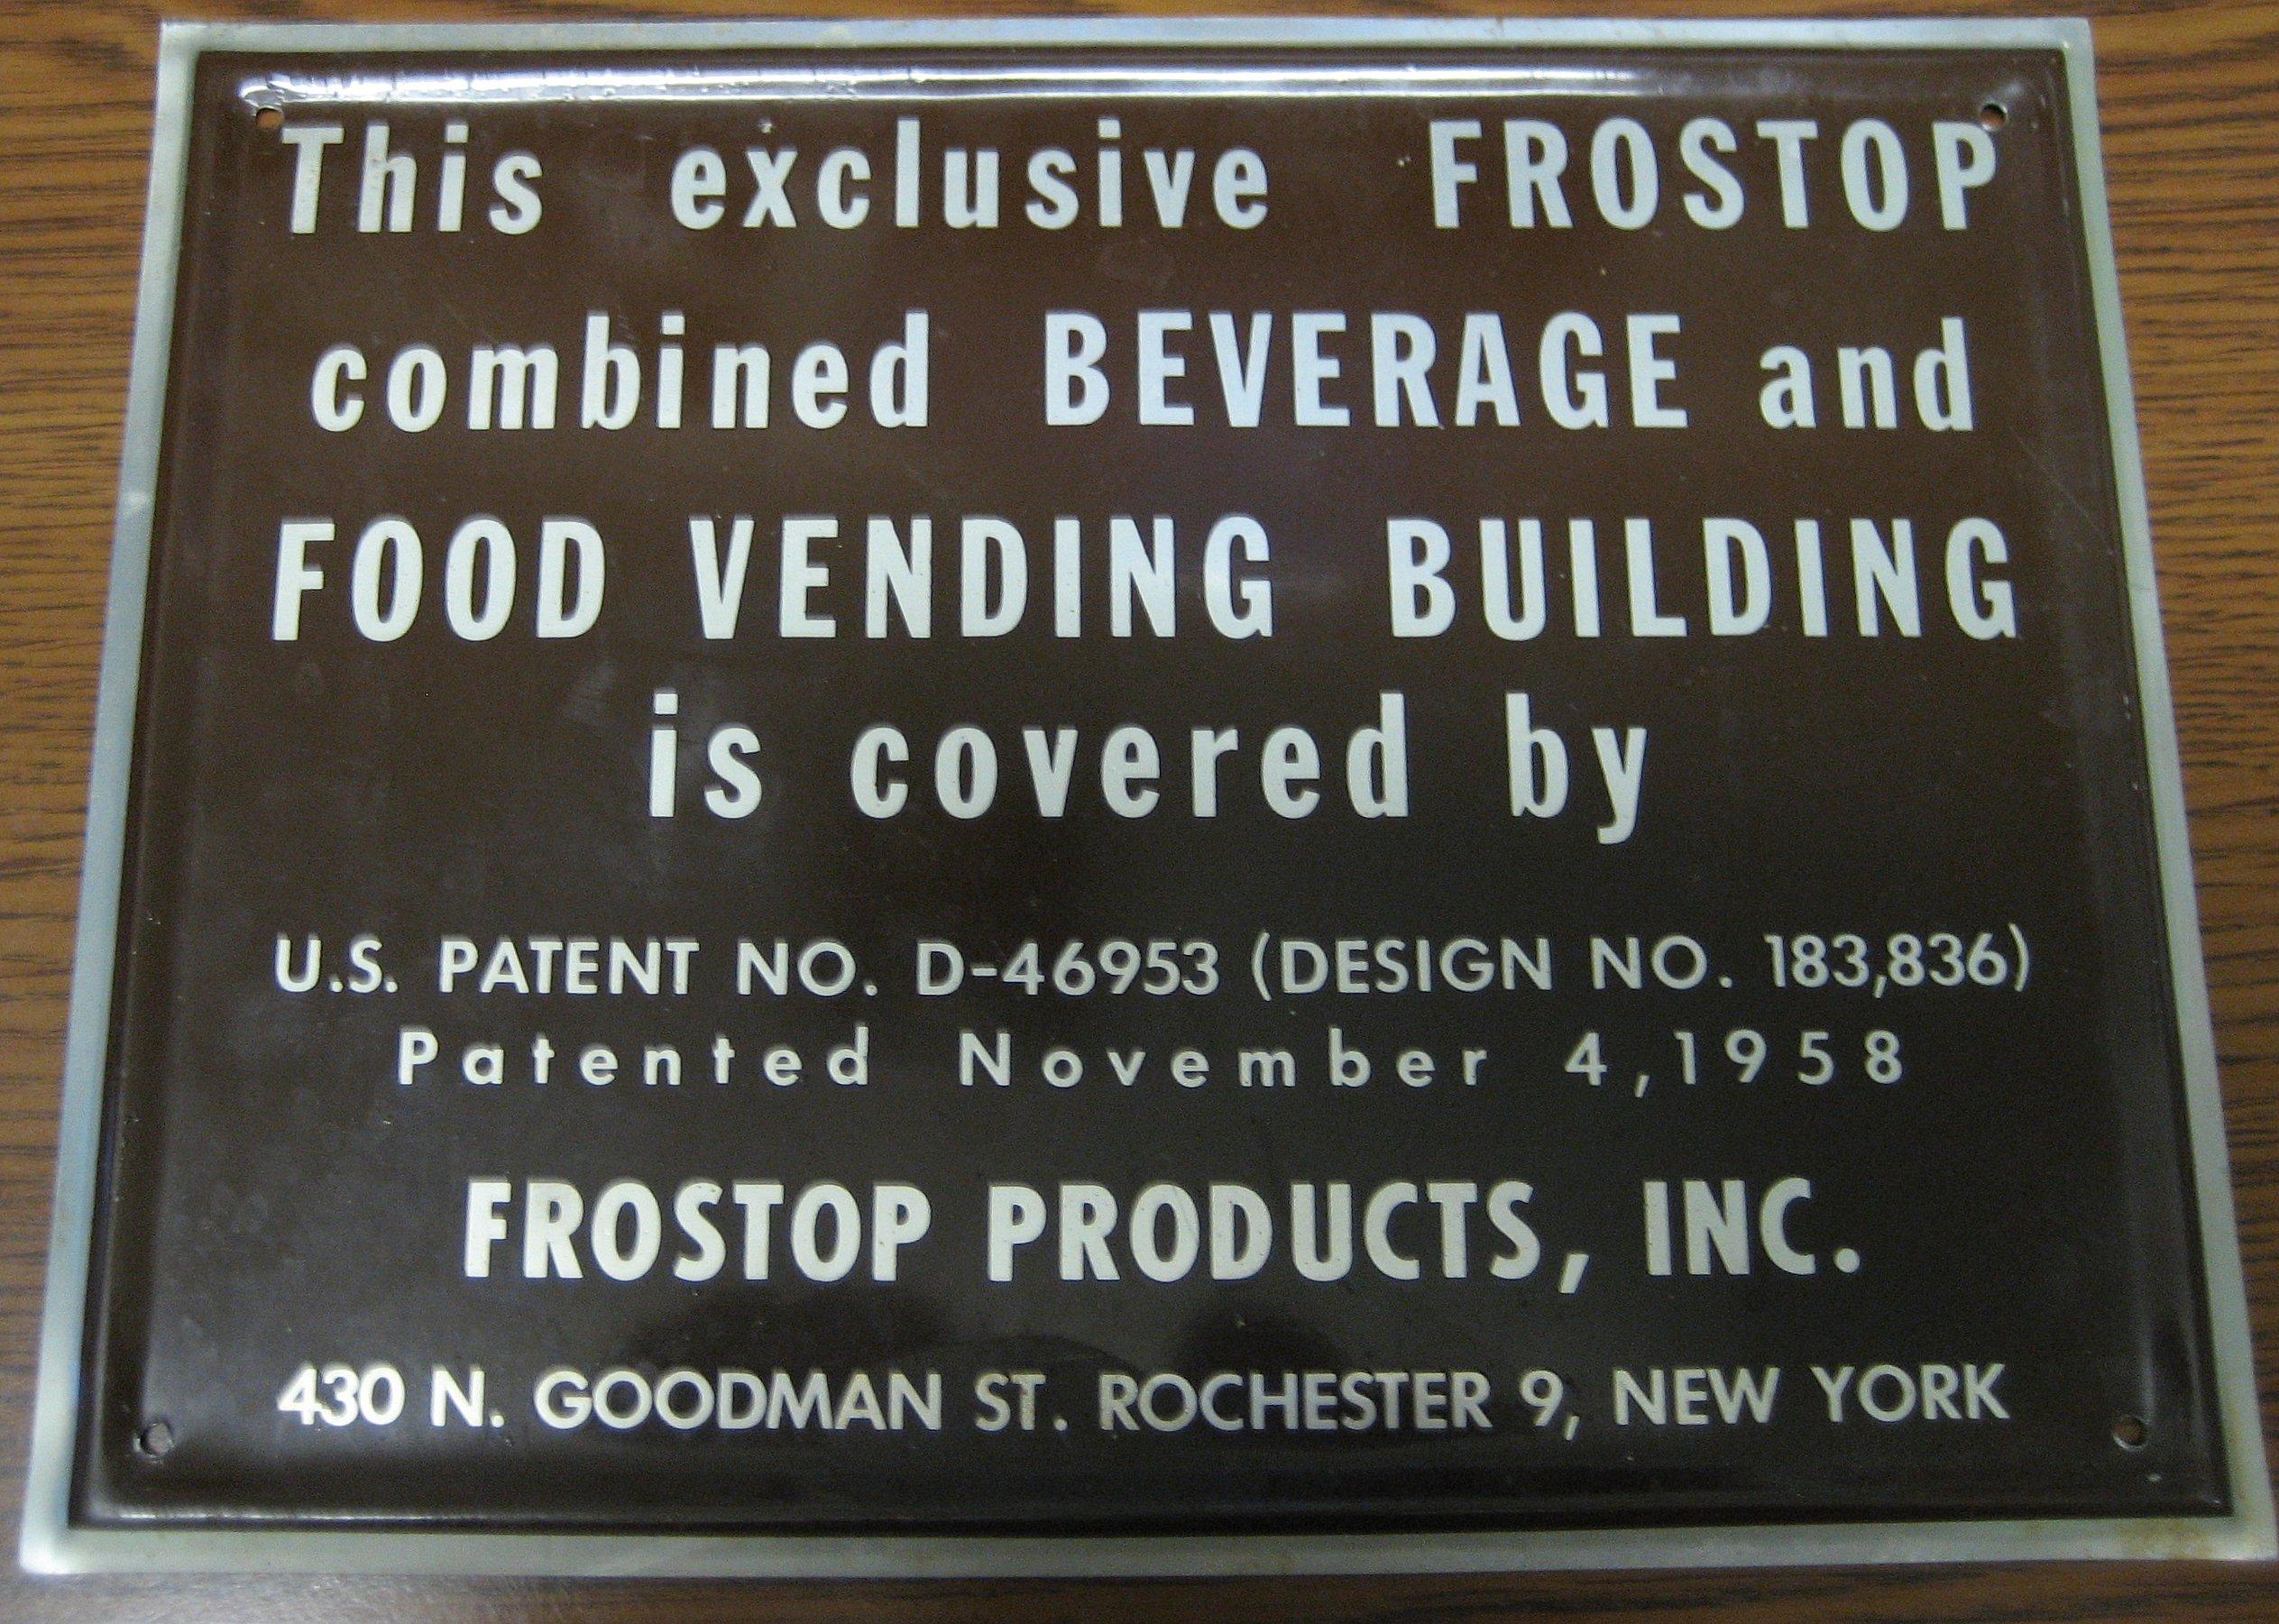 1958 patent